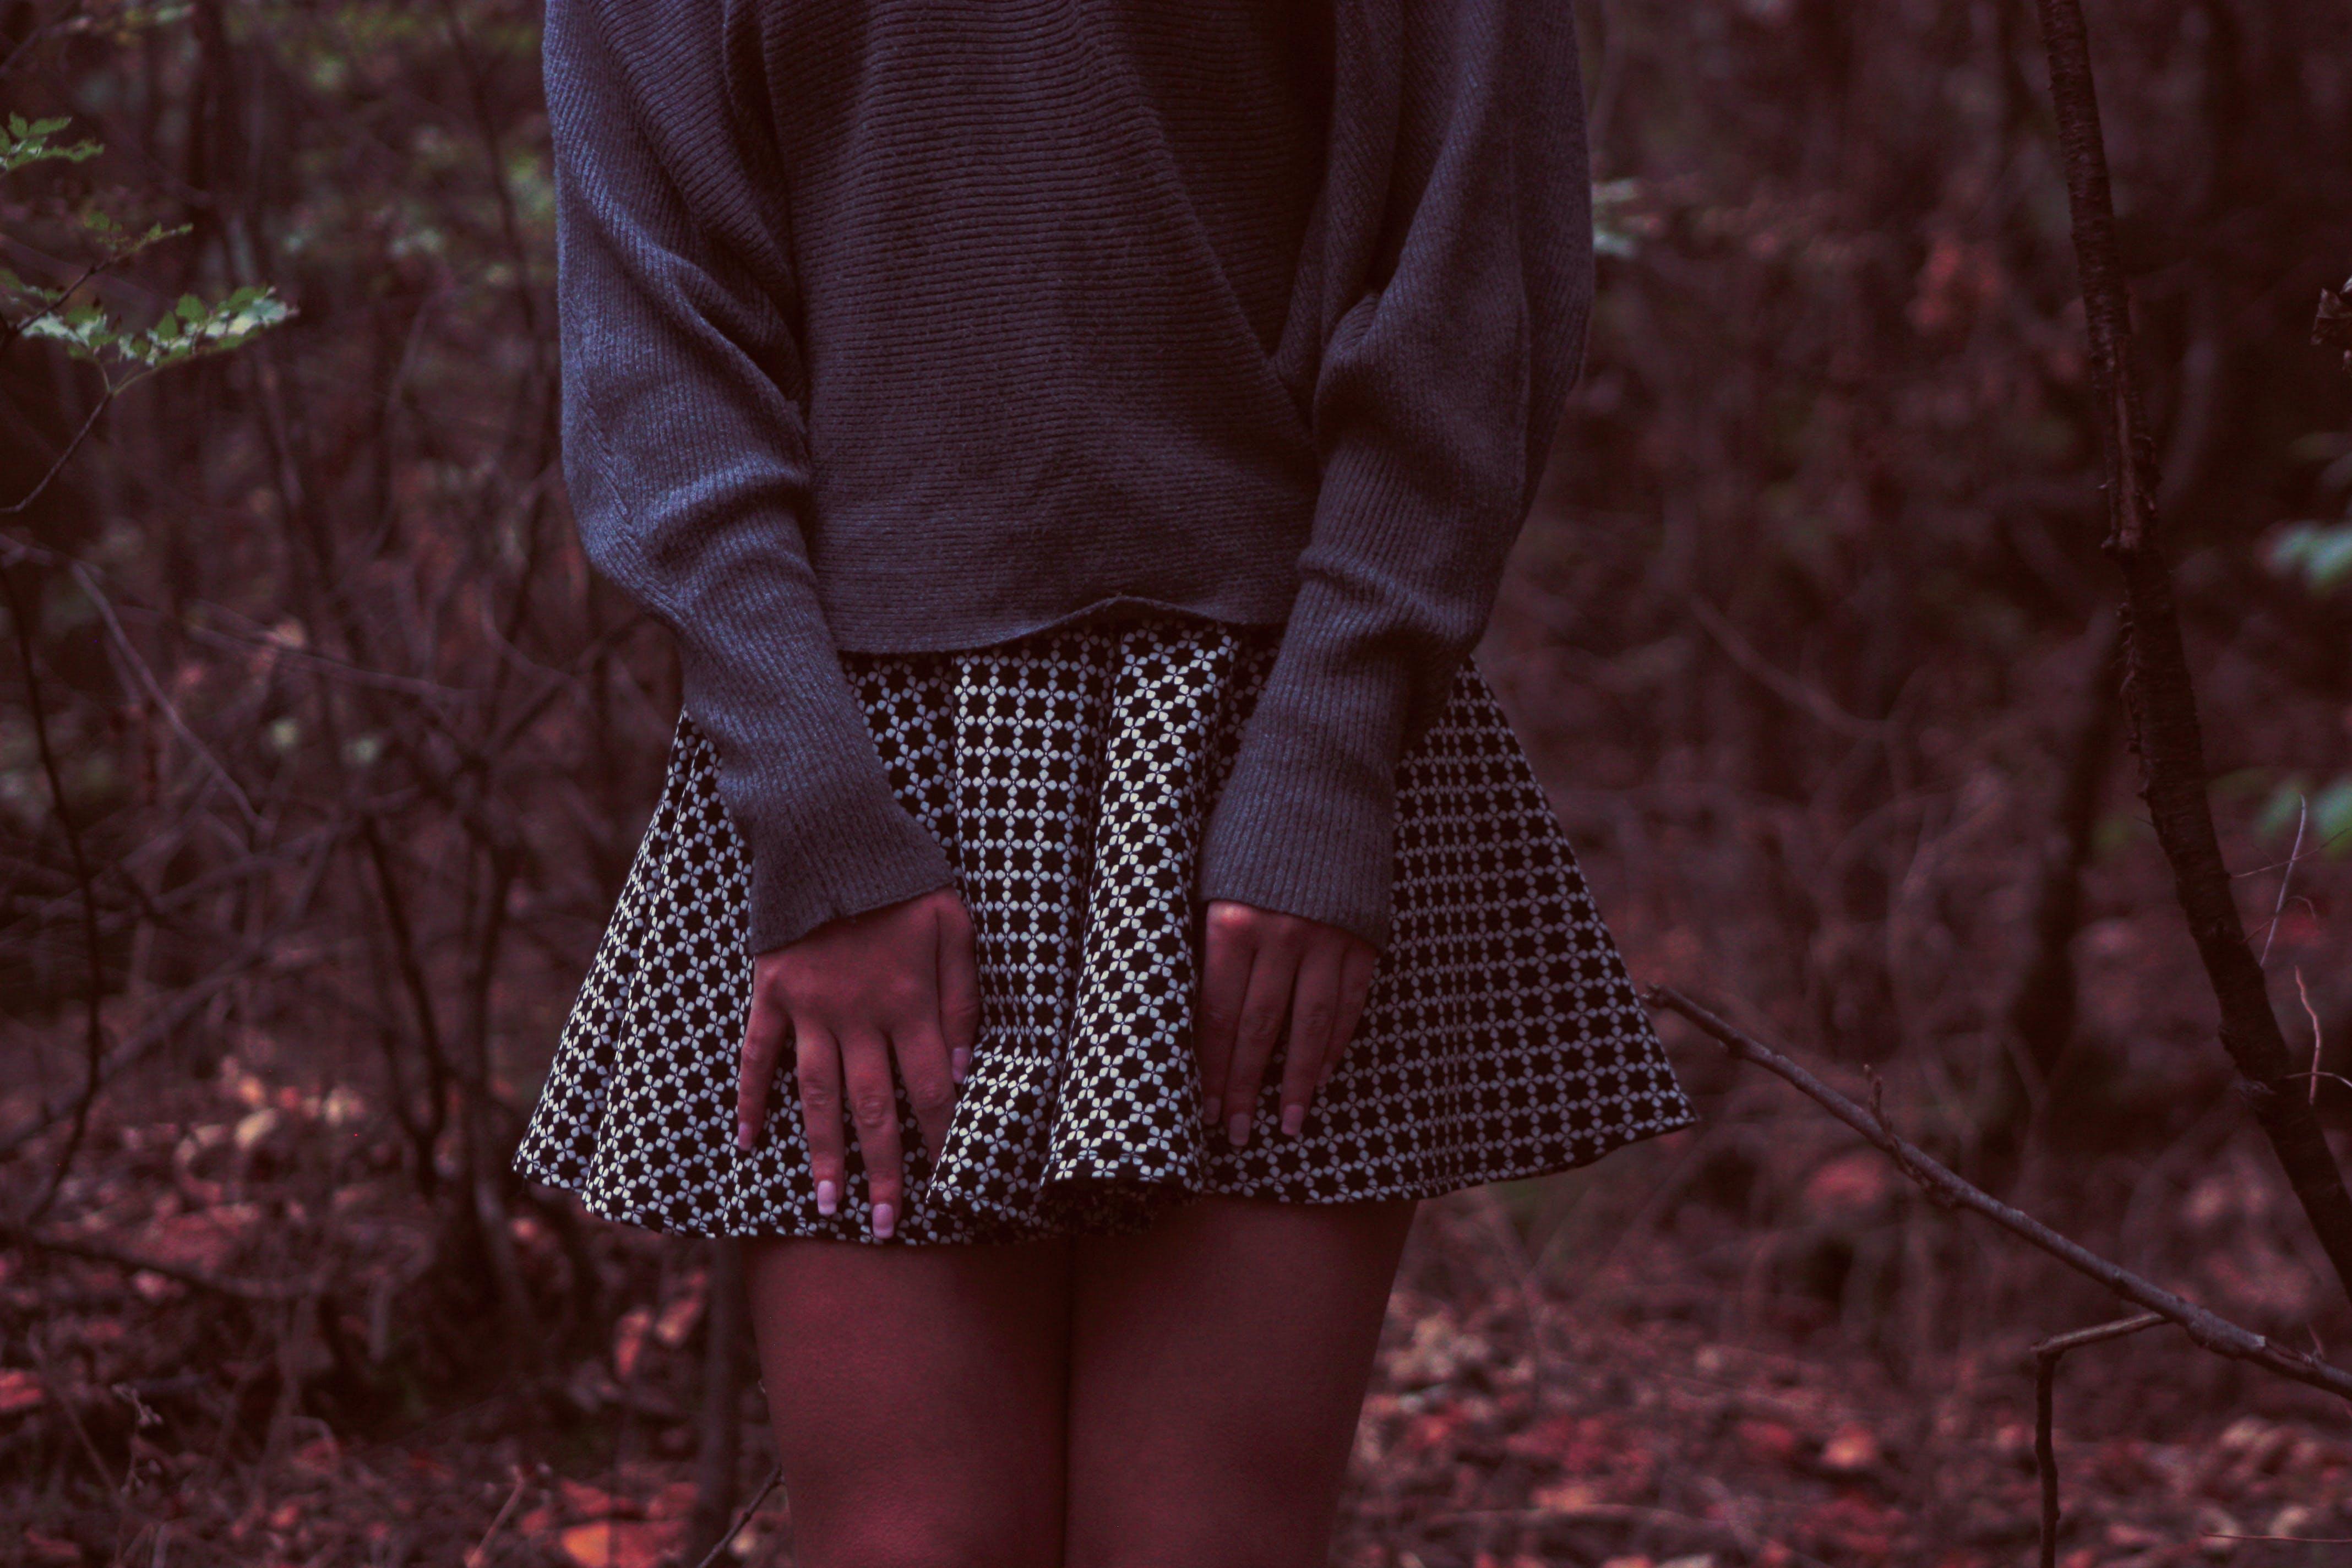 Woman Touching Her Skirt